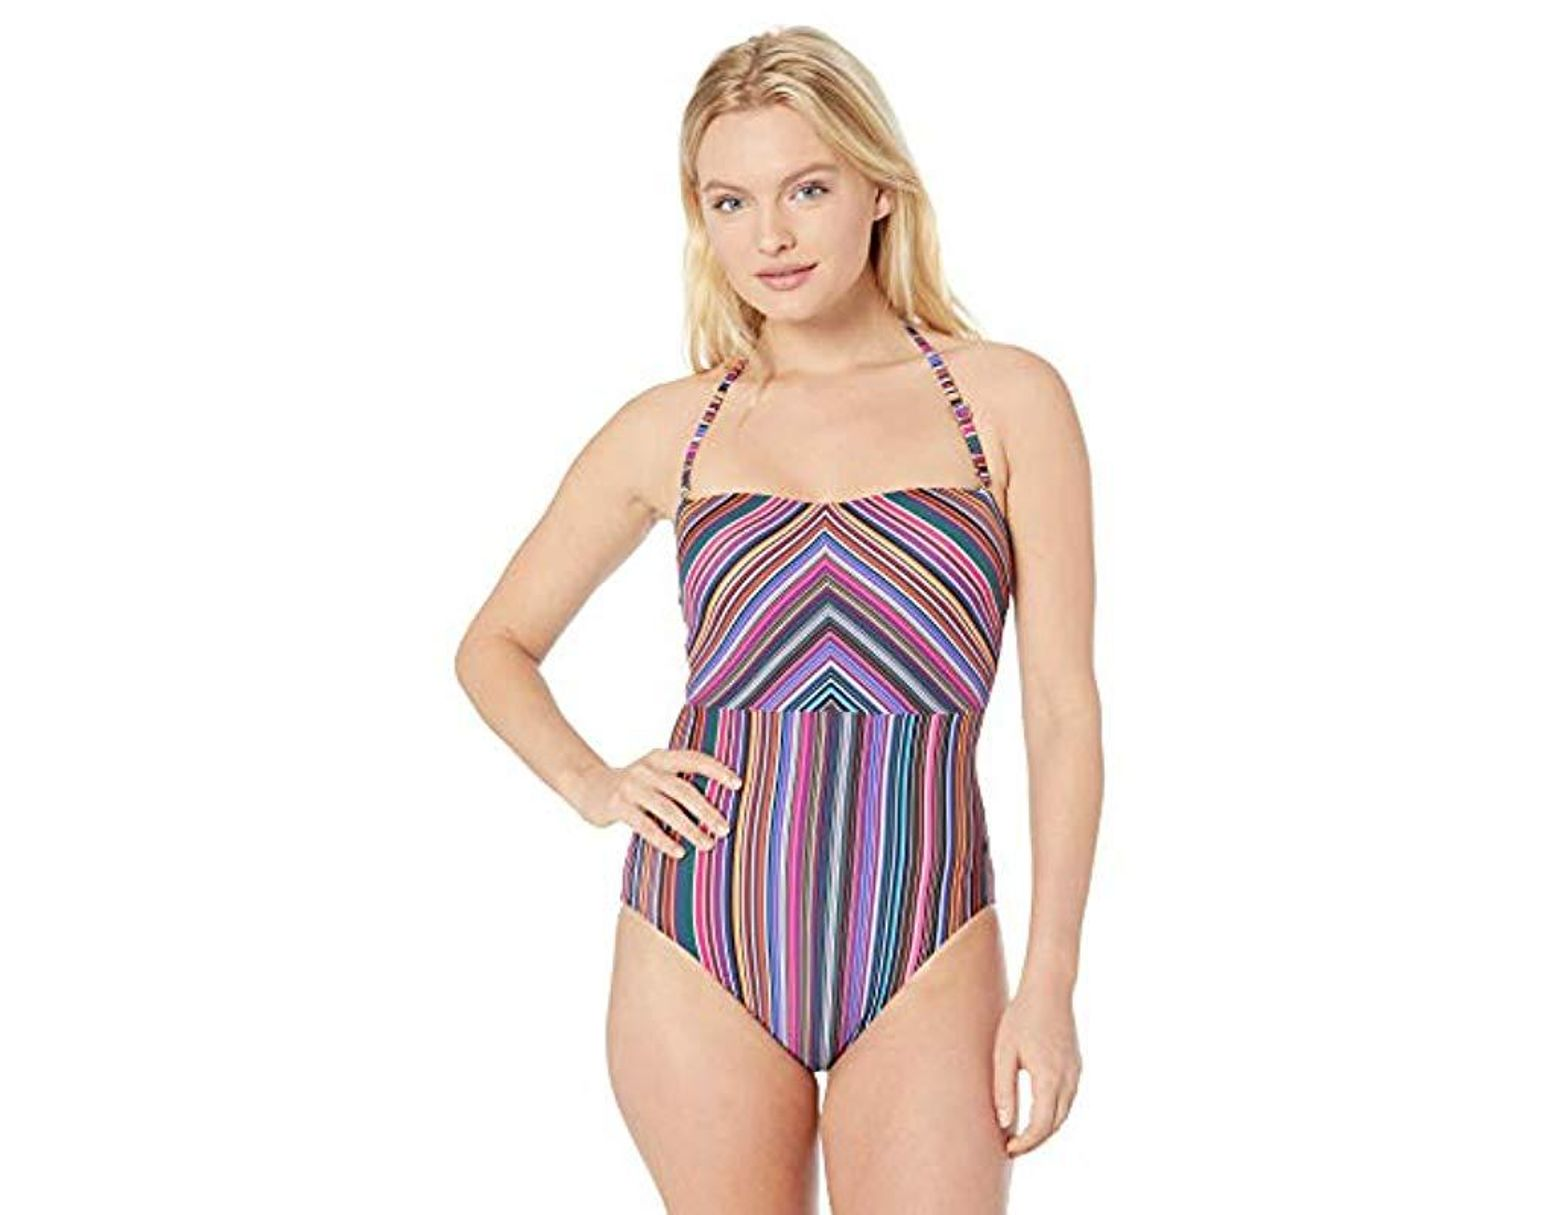 e2953db9658 T Tahari Striped Bandeau One Piece Swimsuit - Lyst